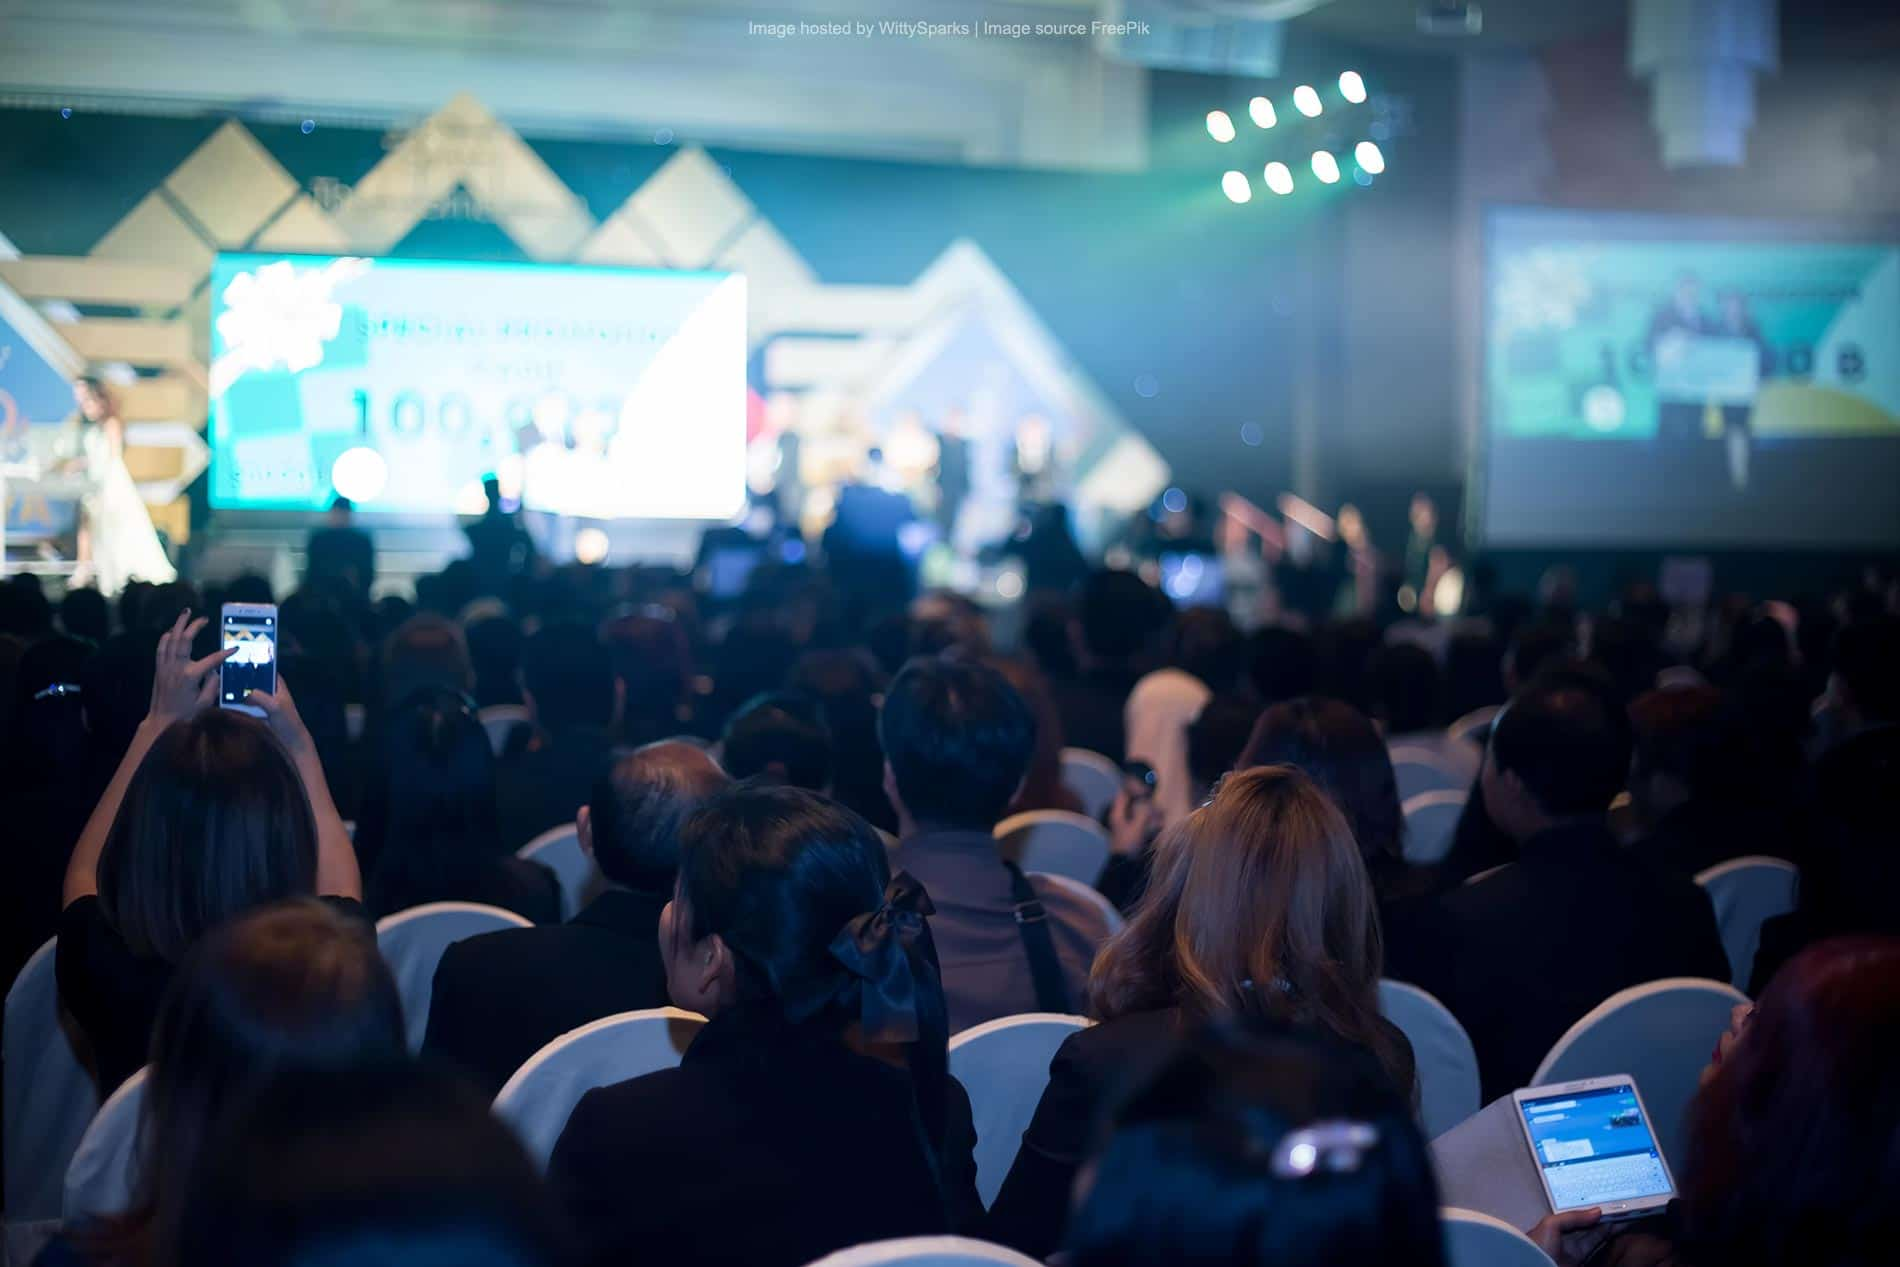 Event organizing companies